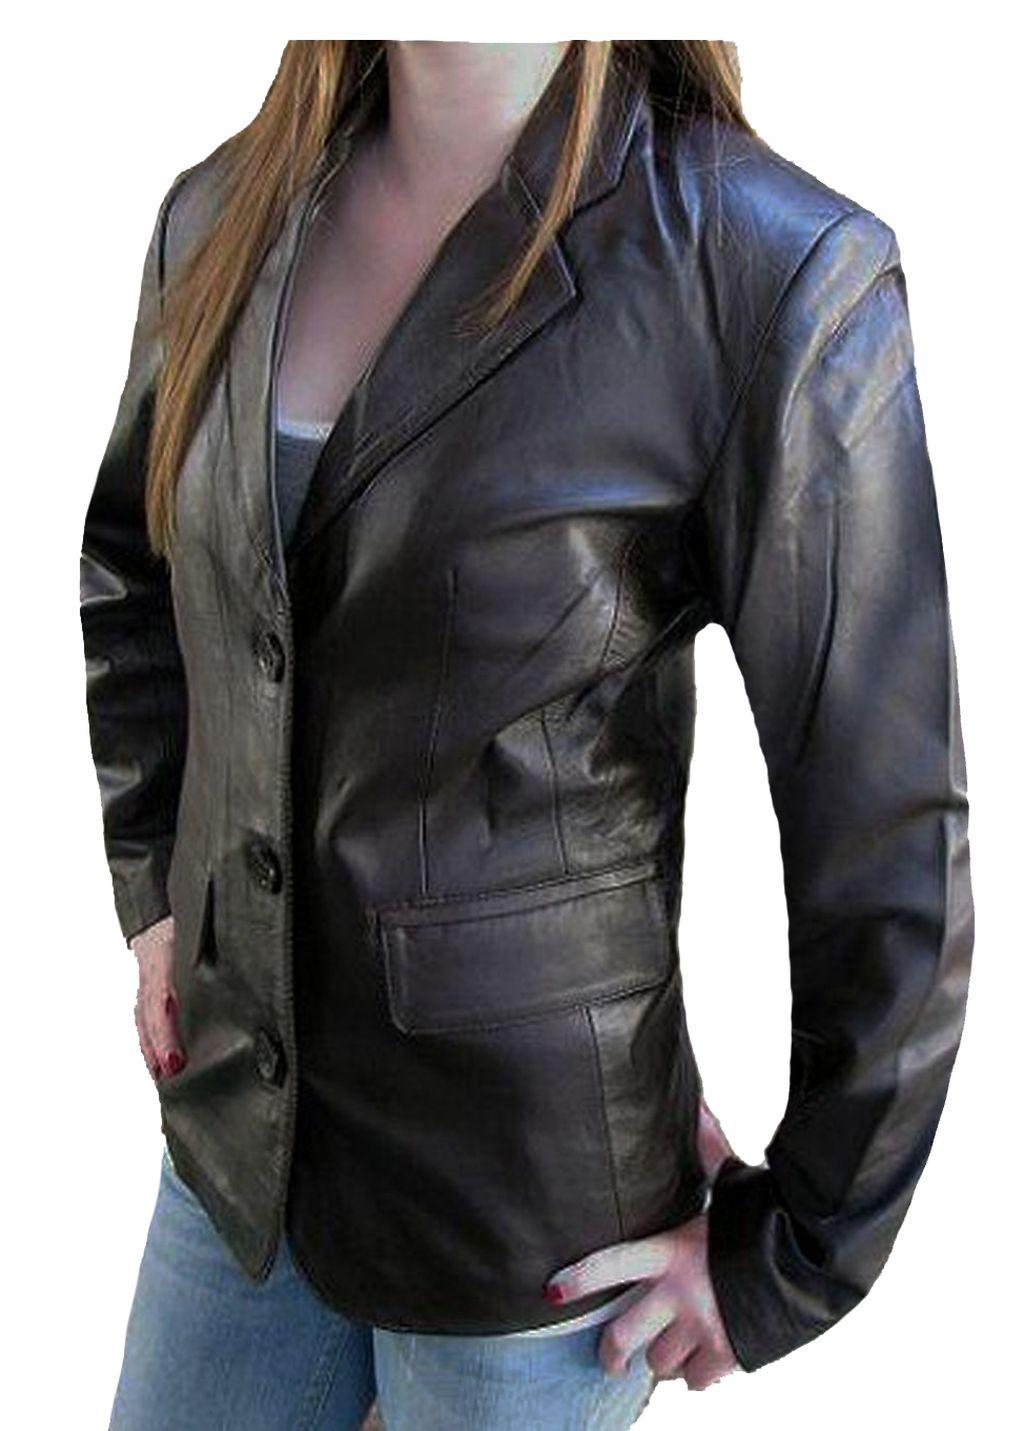 Damen Jacke Business Blazer Lederjacke Braun Gr. S M L XL